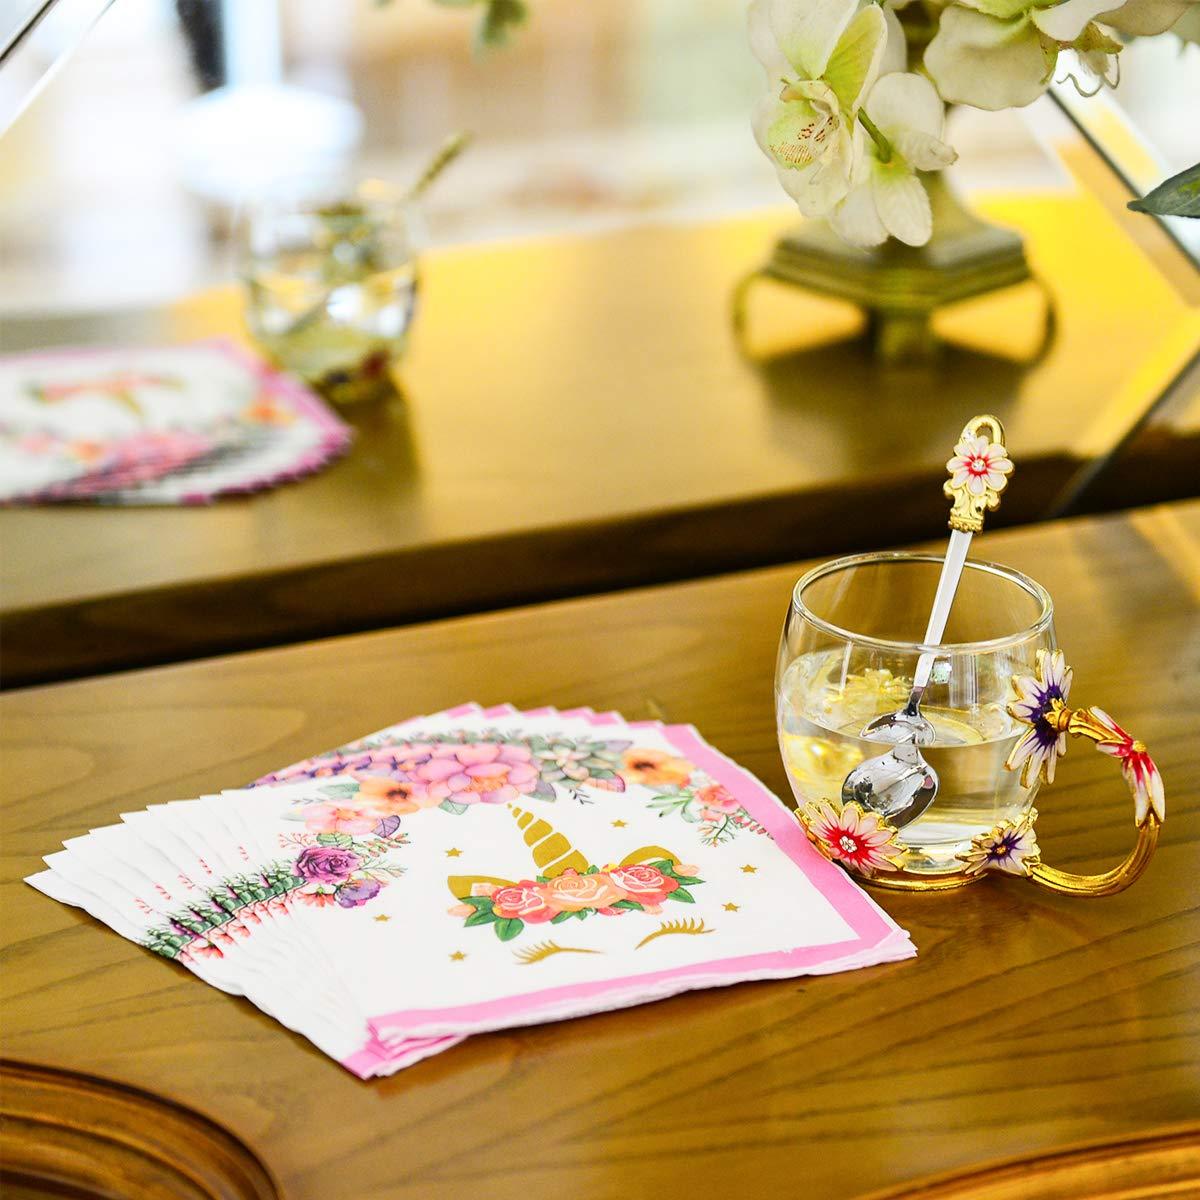 La fete Flamingo Party Napkins-60PCS Luau Disposable Napkin Pink Summer Hawaiian Themed Napkins Tableware for Girl Kids Birthday Dinner Baby Shower Wedding Lunch Napkins Paper